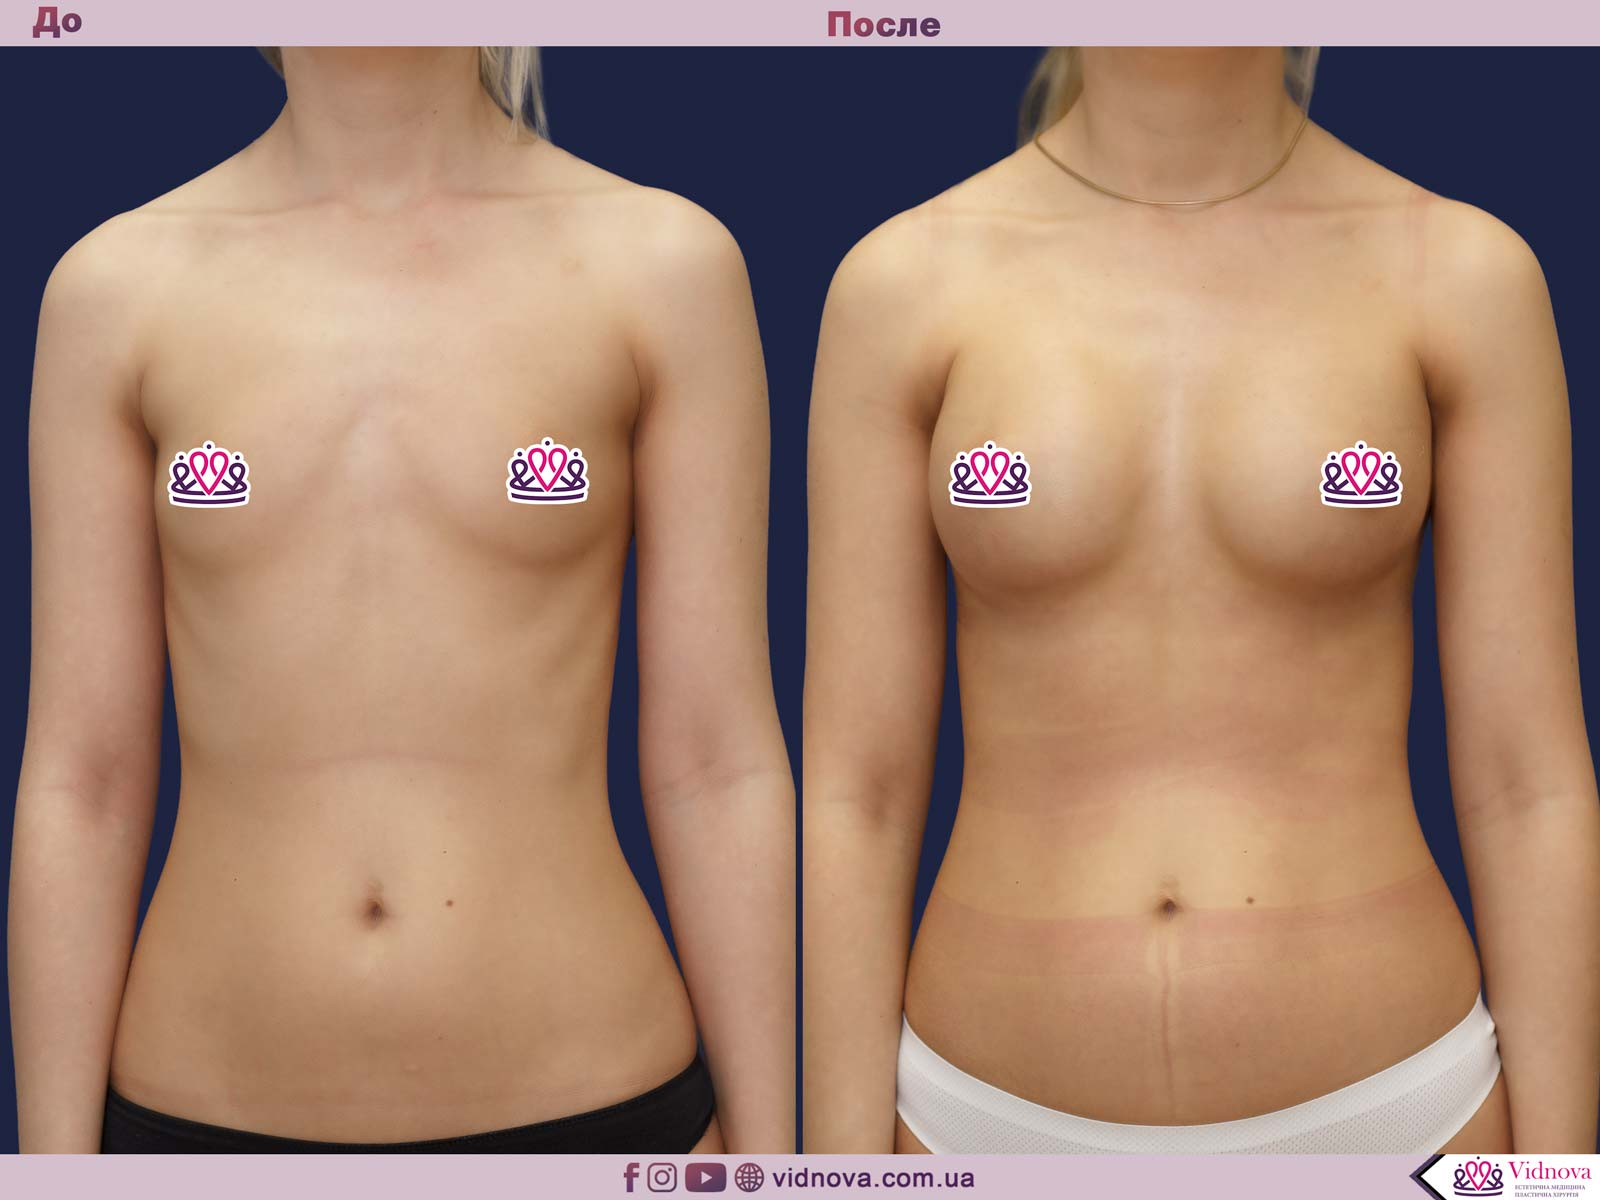 Увеличение груди: Фото ДО и ПОСЛЕ - Пример №57-1 - Клиника Vidnova